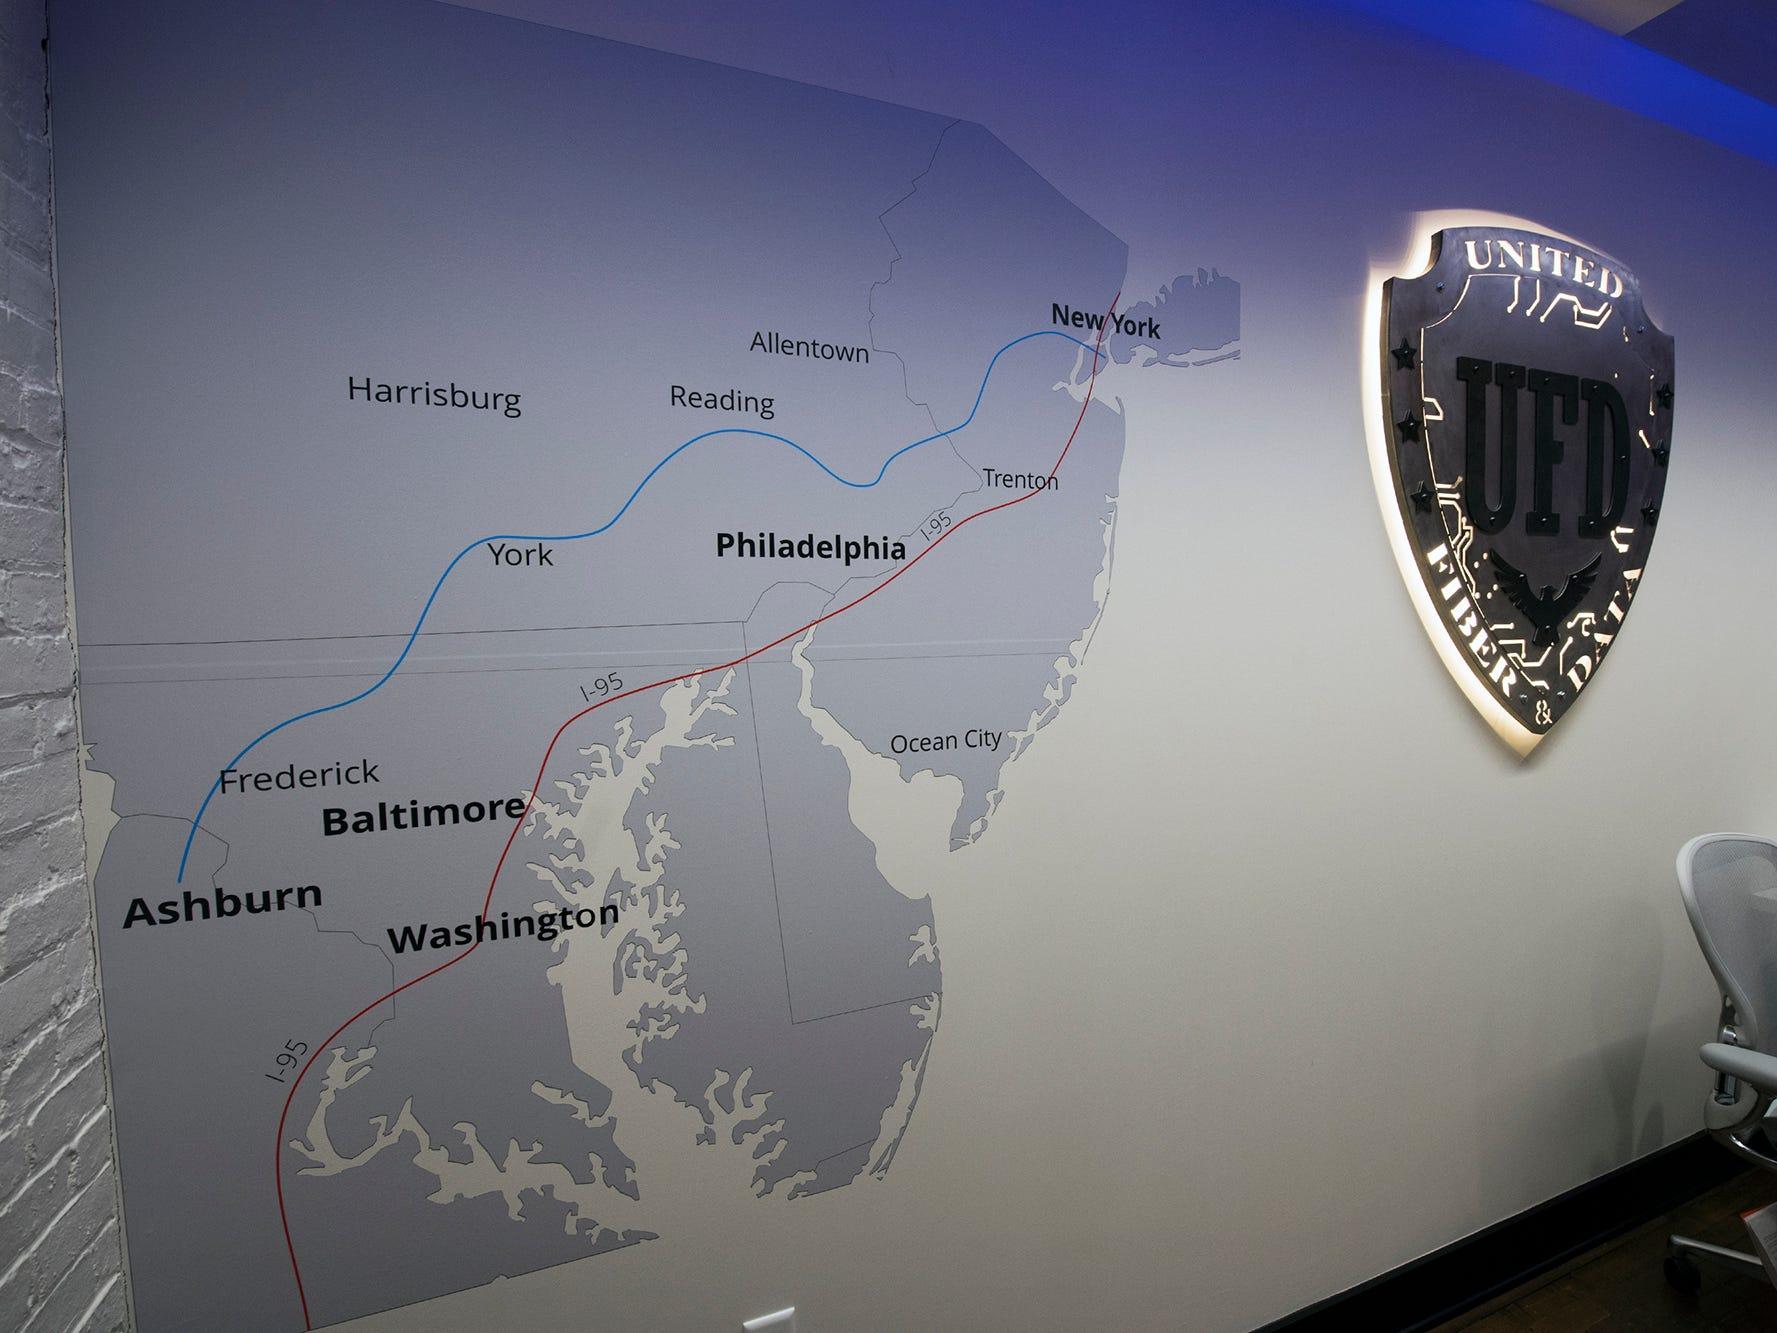 The fiber data line will run from Ashburn, Virginia to New York City.